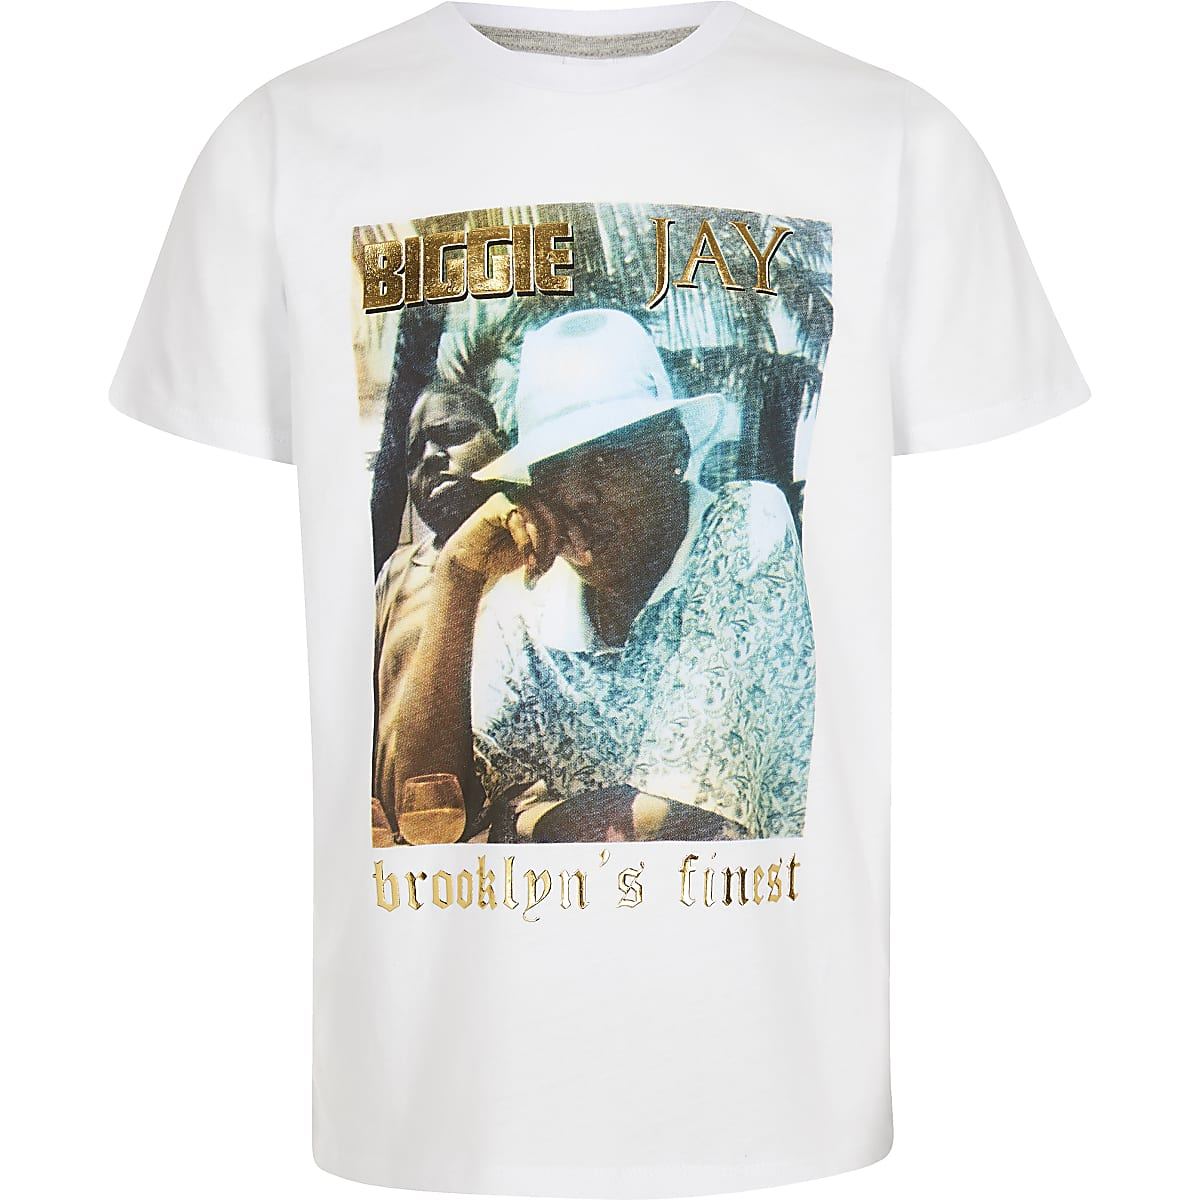 Boys 'Brooklyn's finest' T-shirt